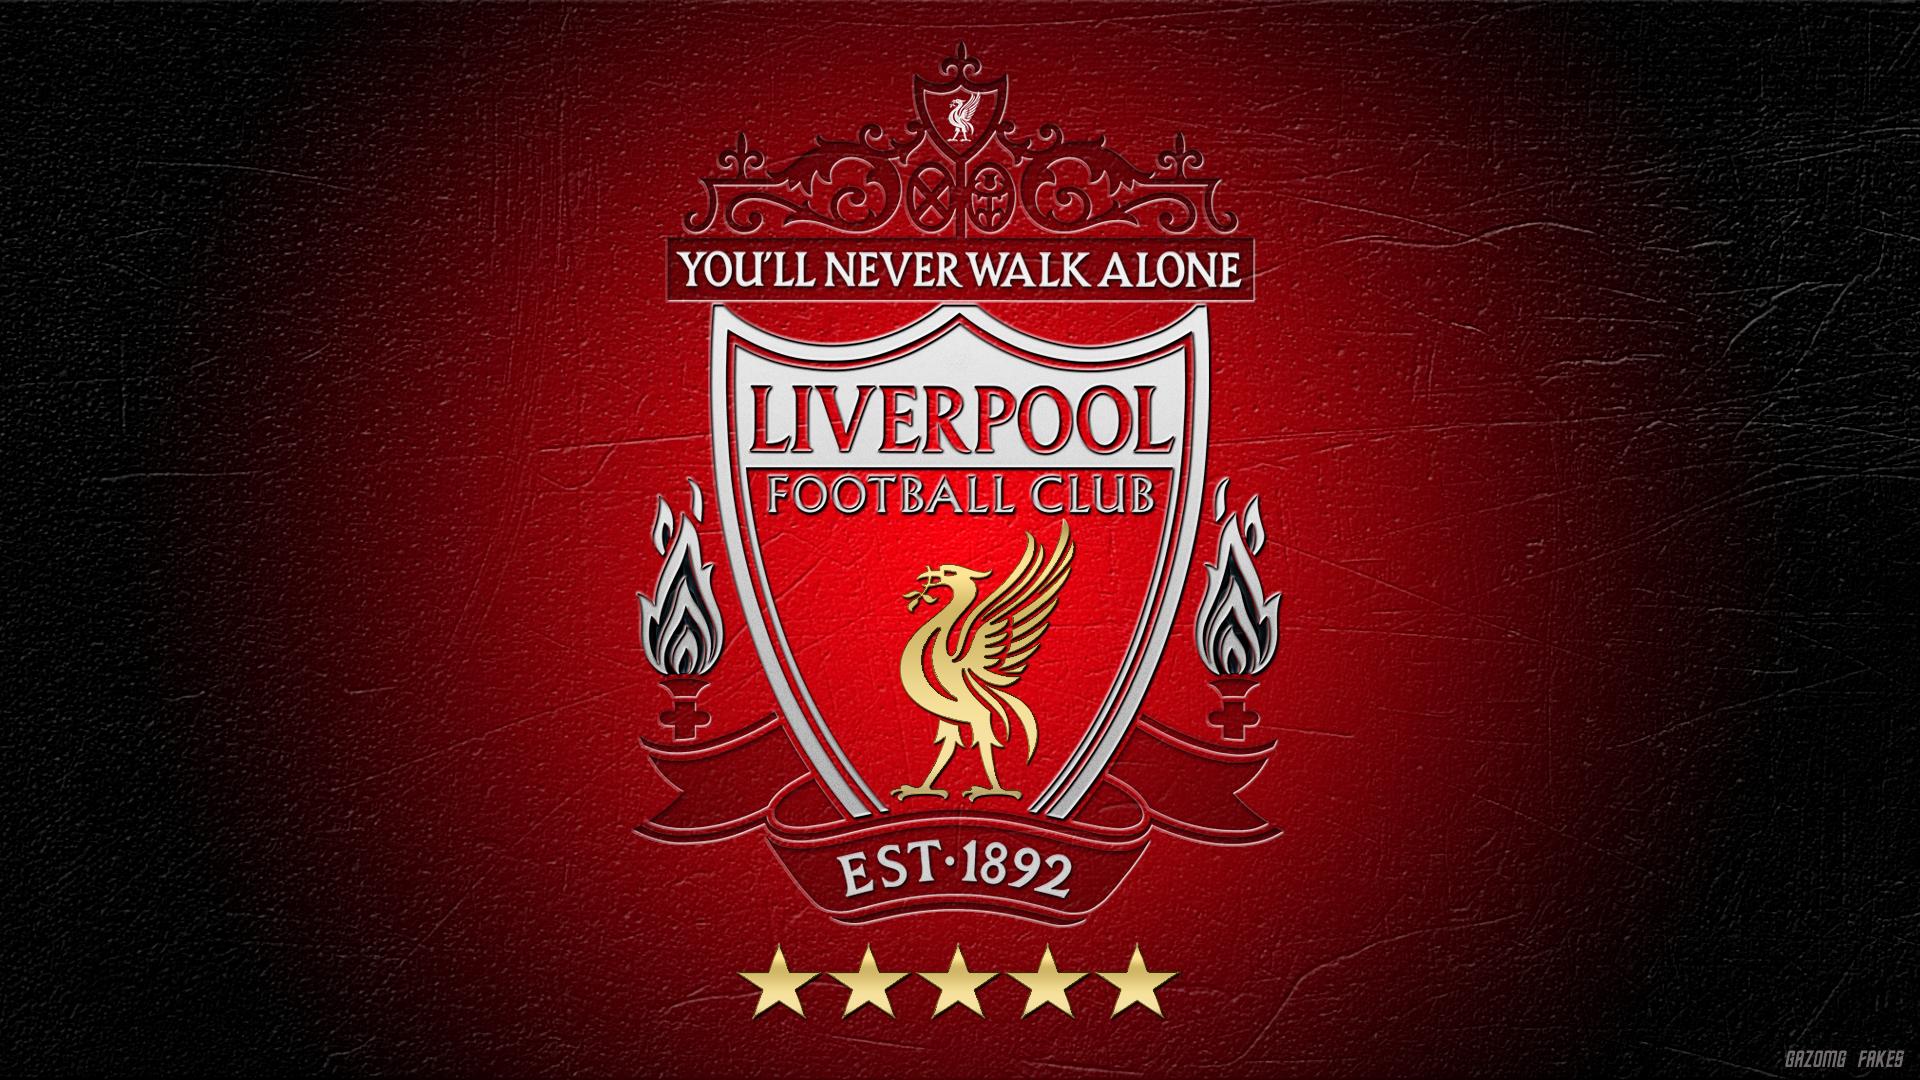 Fonds dcran Liverpool Fc tous les wallpapers Liverpool Fc 1920x1080